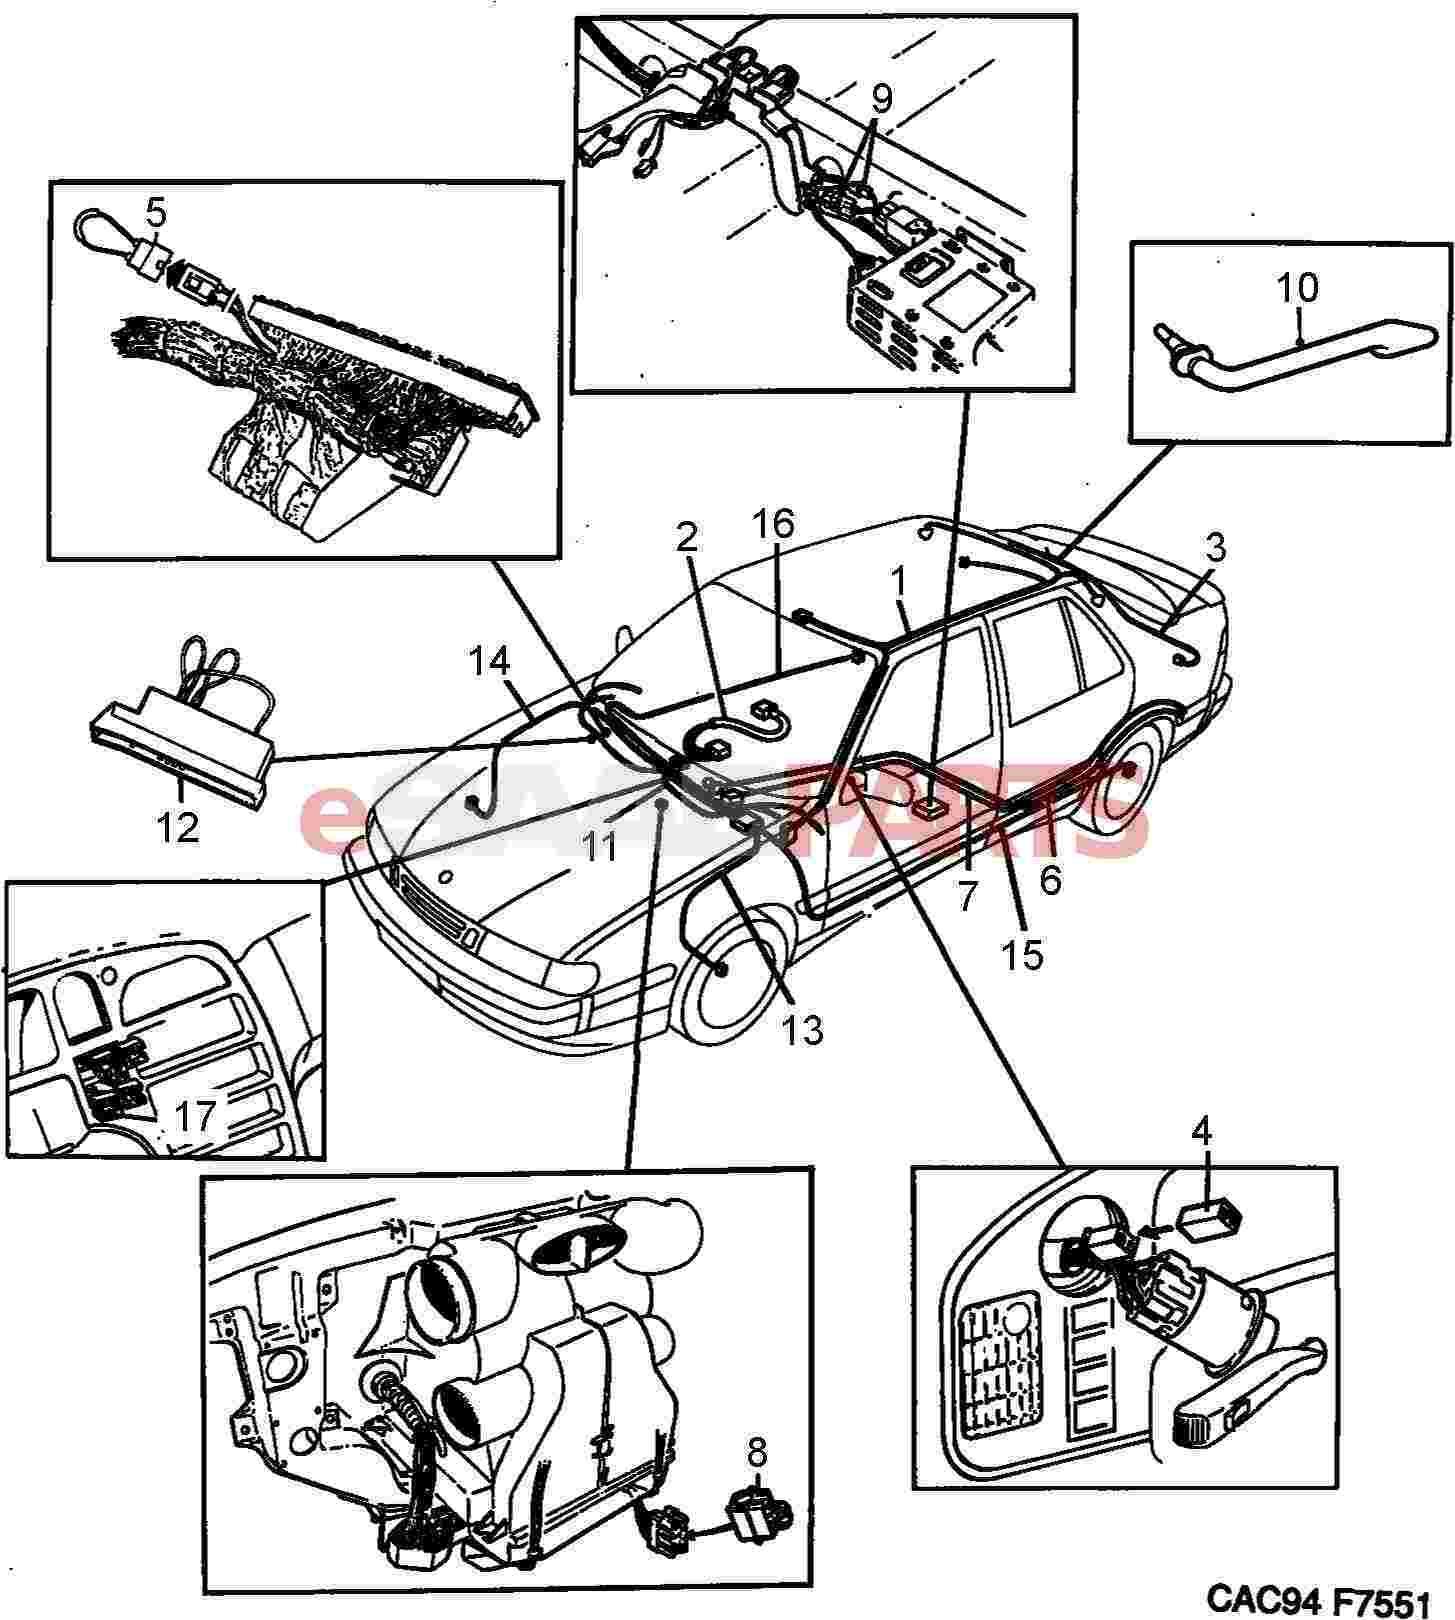 Wiring Diagram For Saab